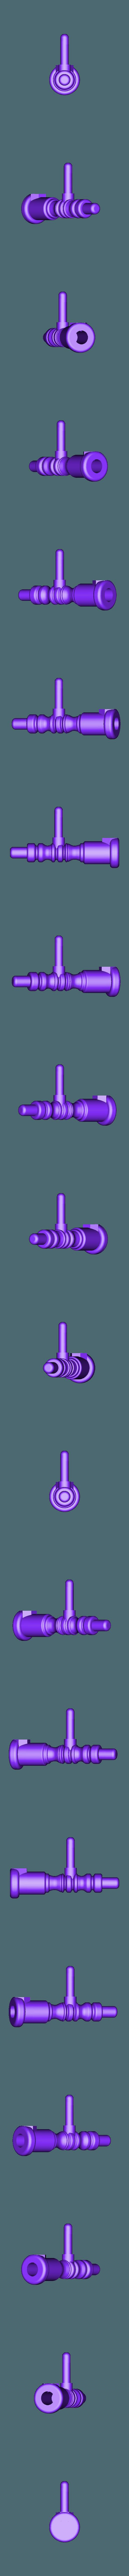 fiche_a_lacets.stl Download free STL file hinge hinge • 3D printable object, veroniqueduval9118